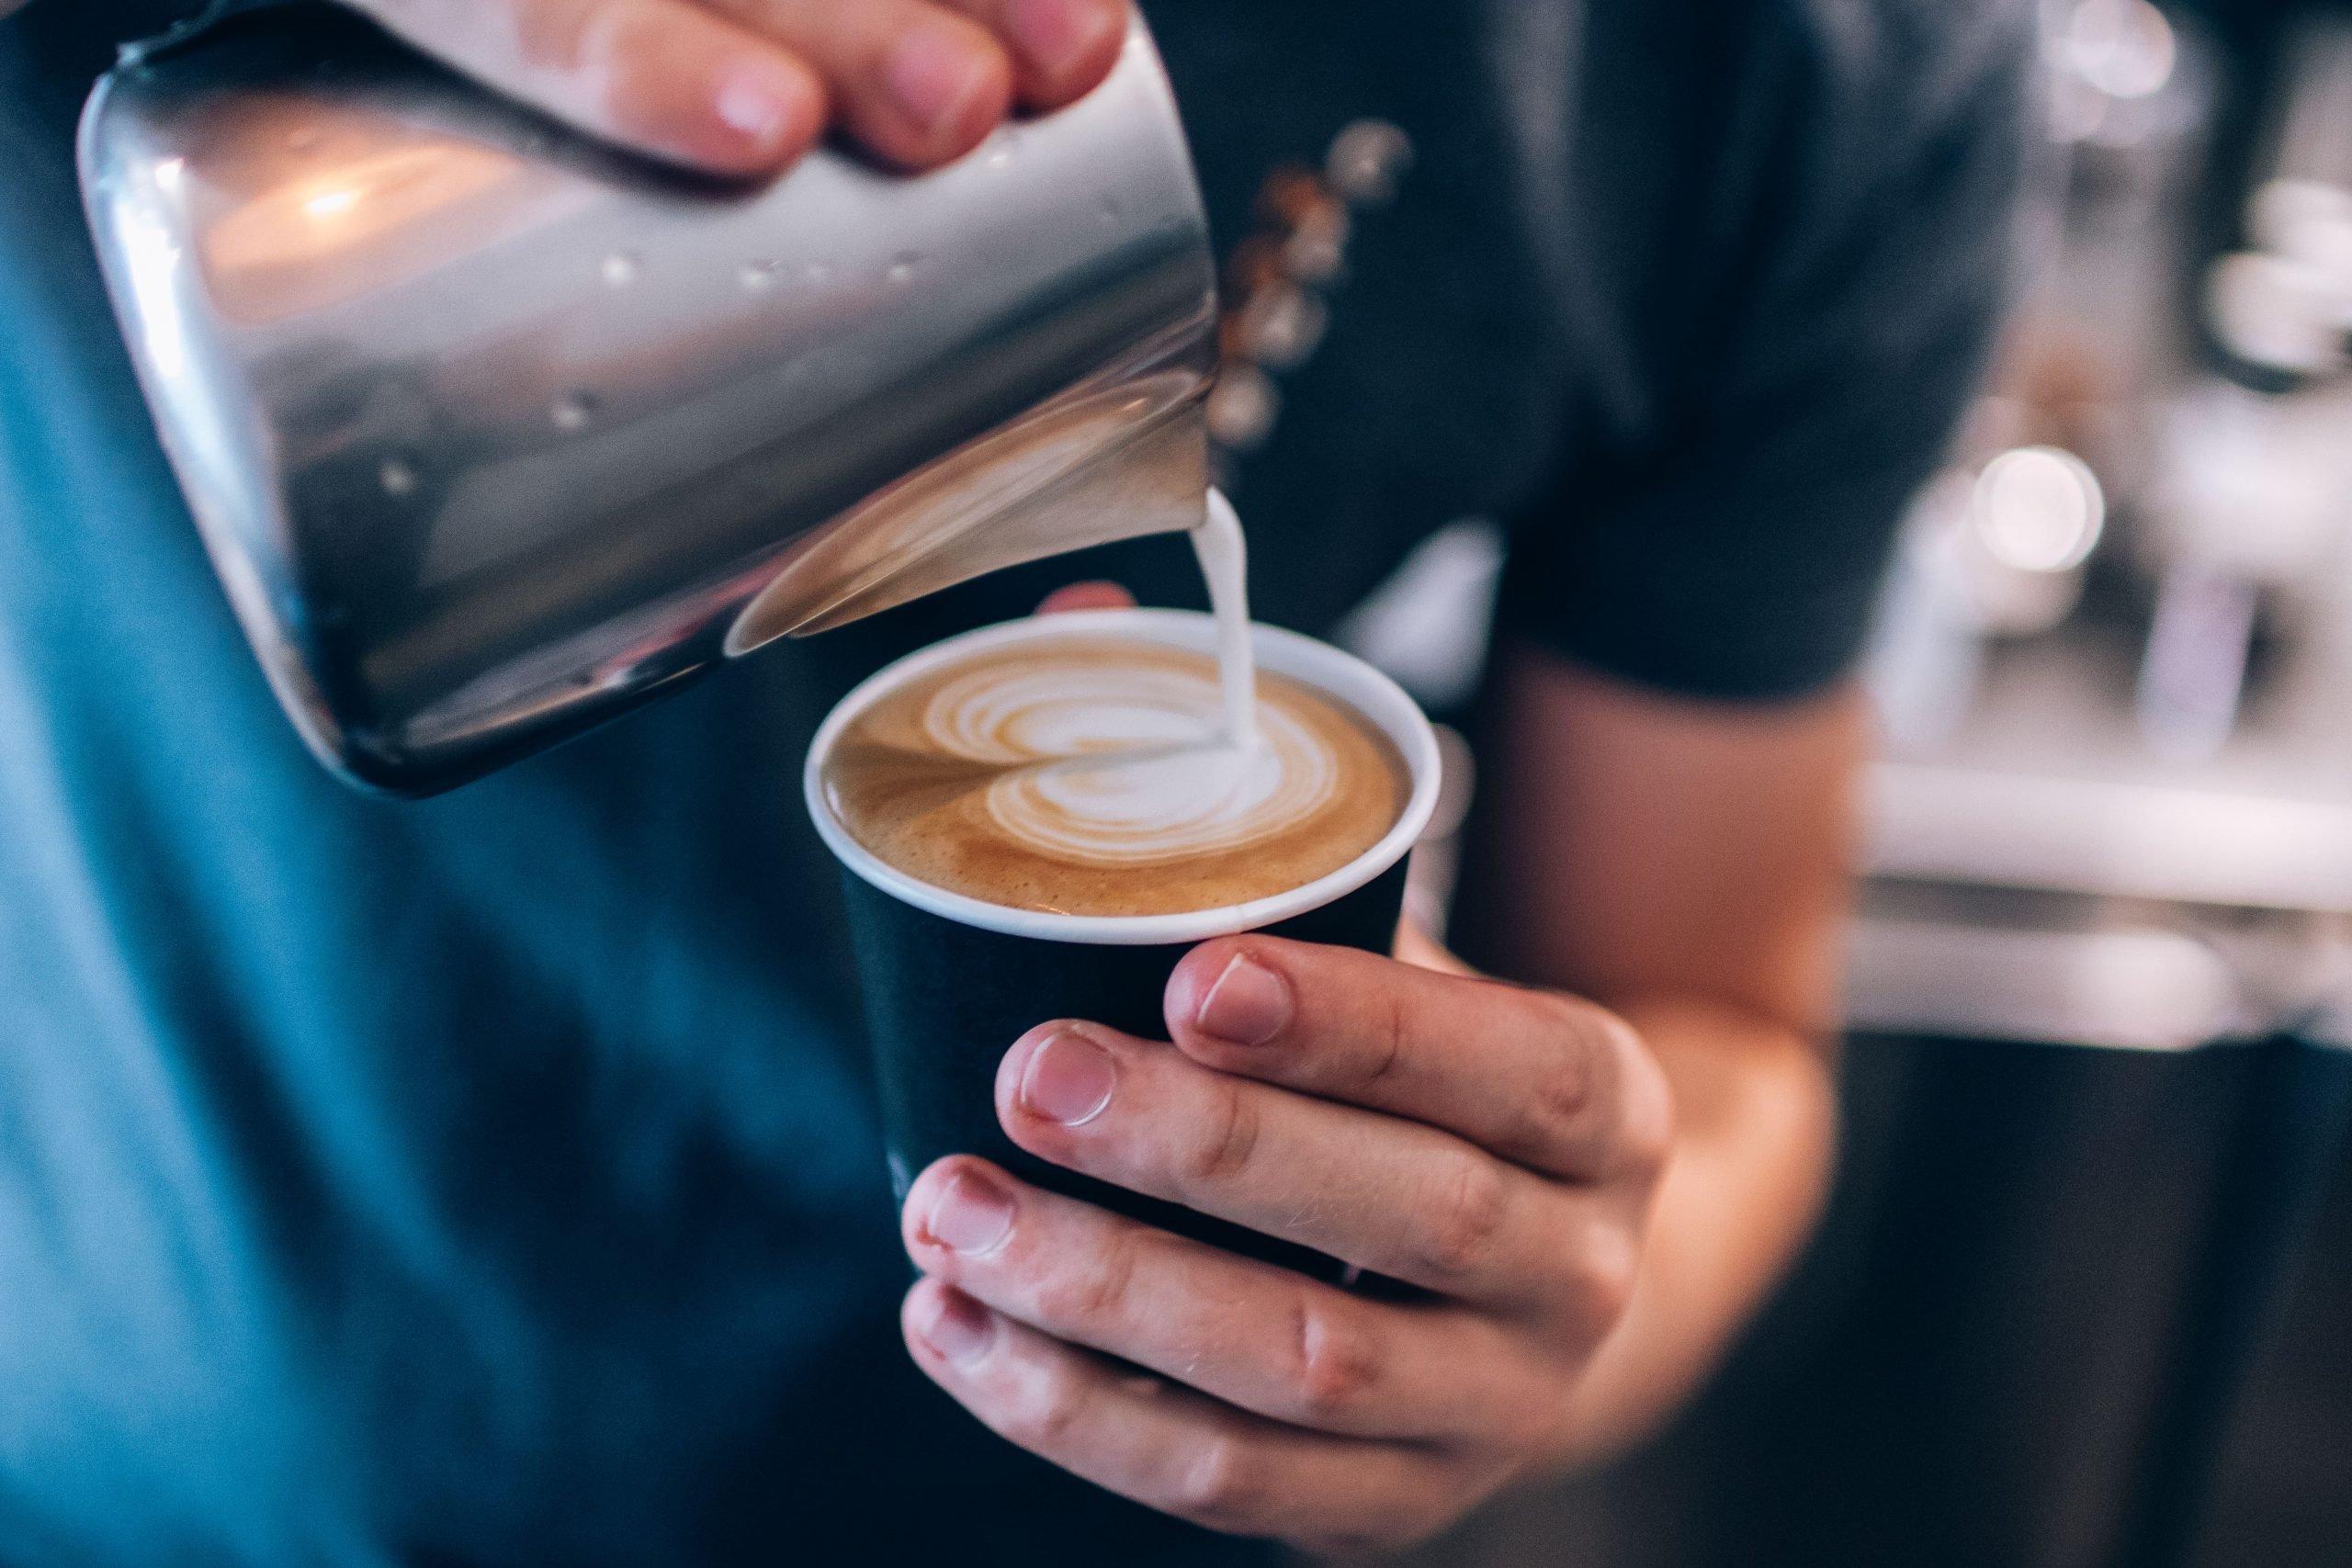 Café macchiato sendo servido na xícara.